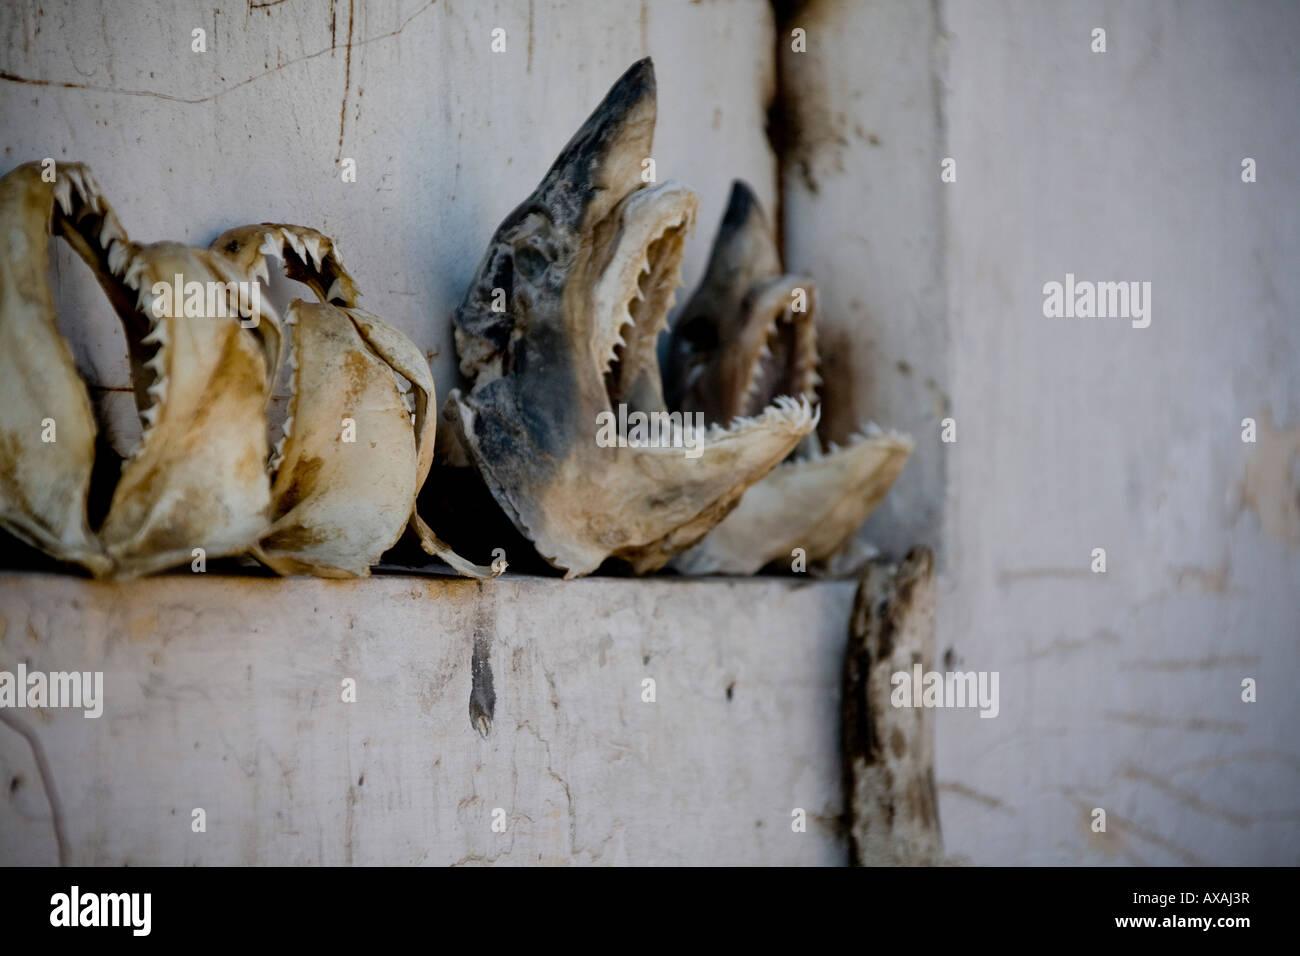 Head of shark, jaws for sale by street seller in Agadir